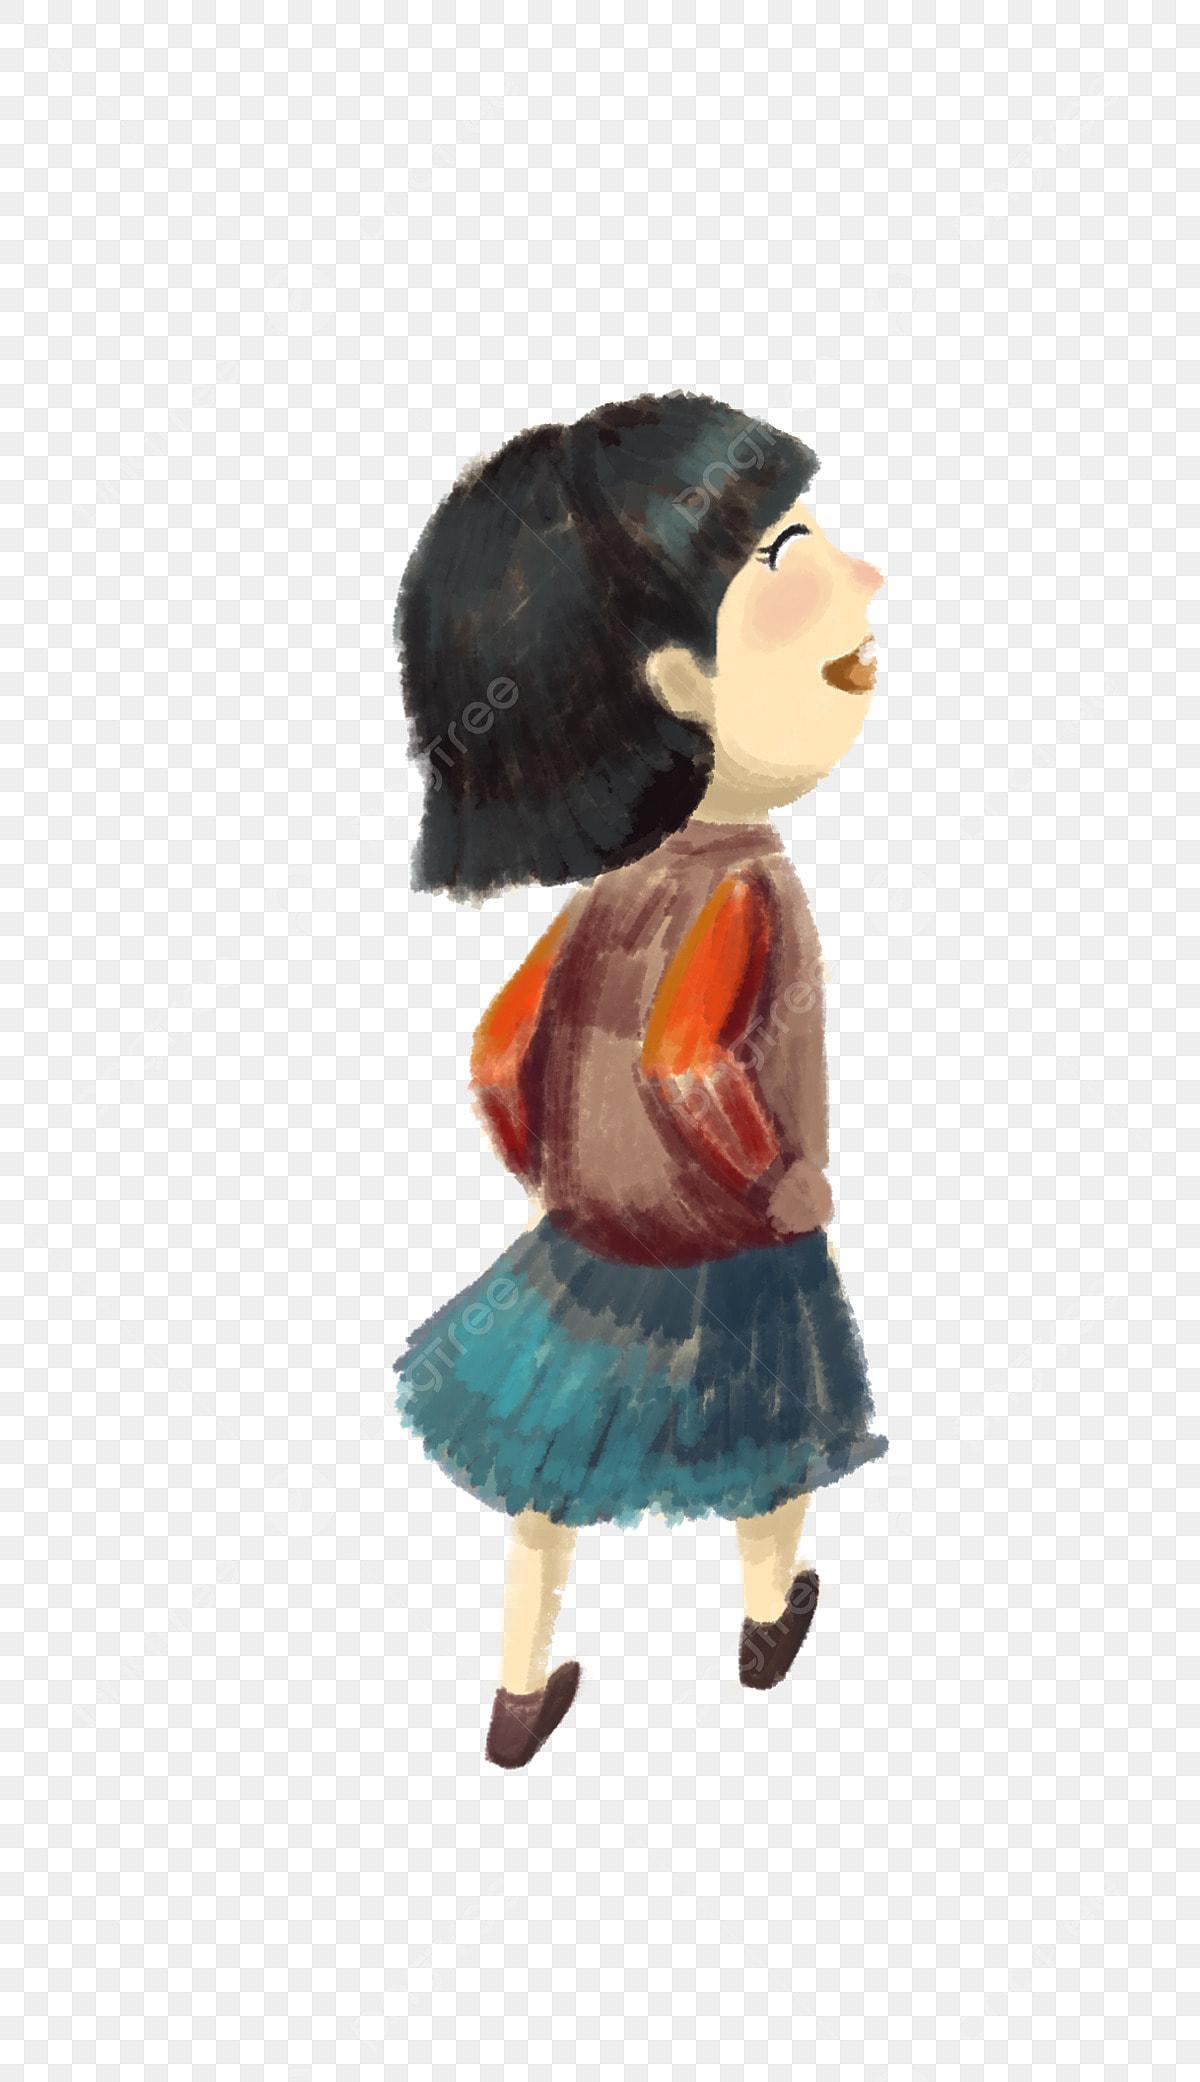 Cartoon Hand Drawn Short Hair Little Girl Cartoon Girl Hand